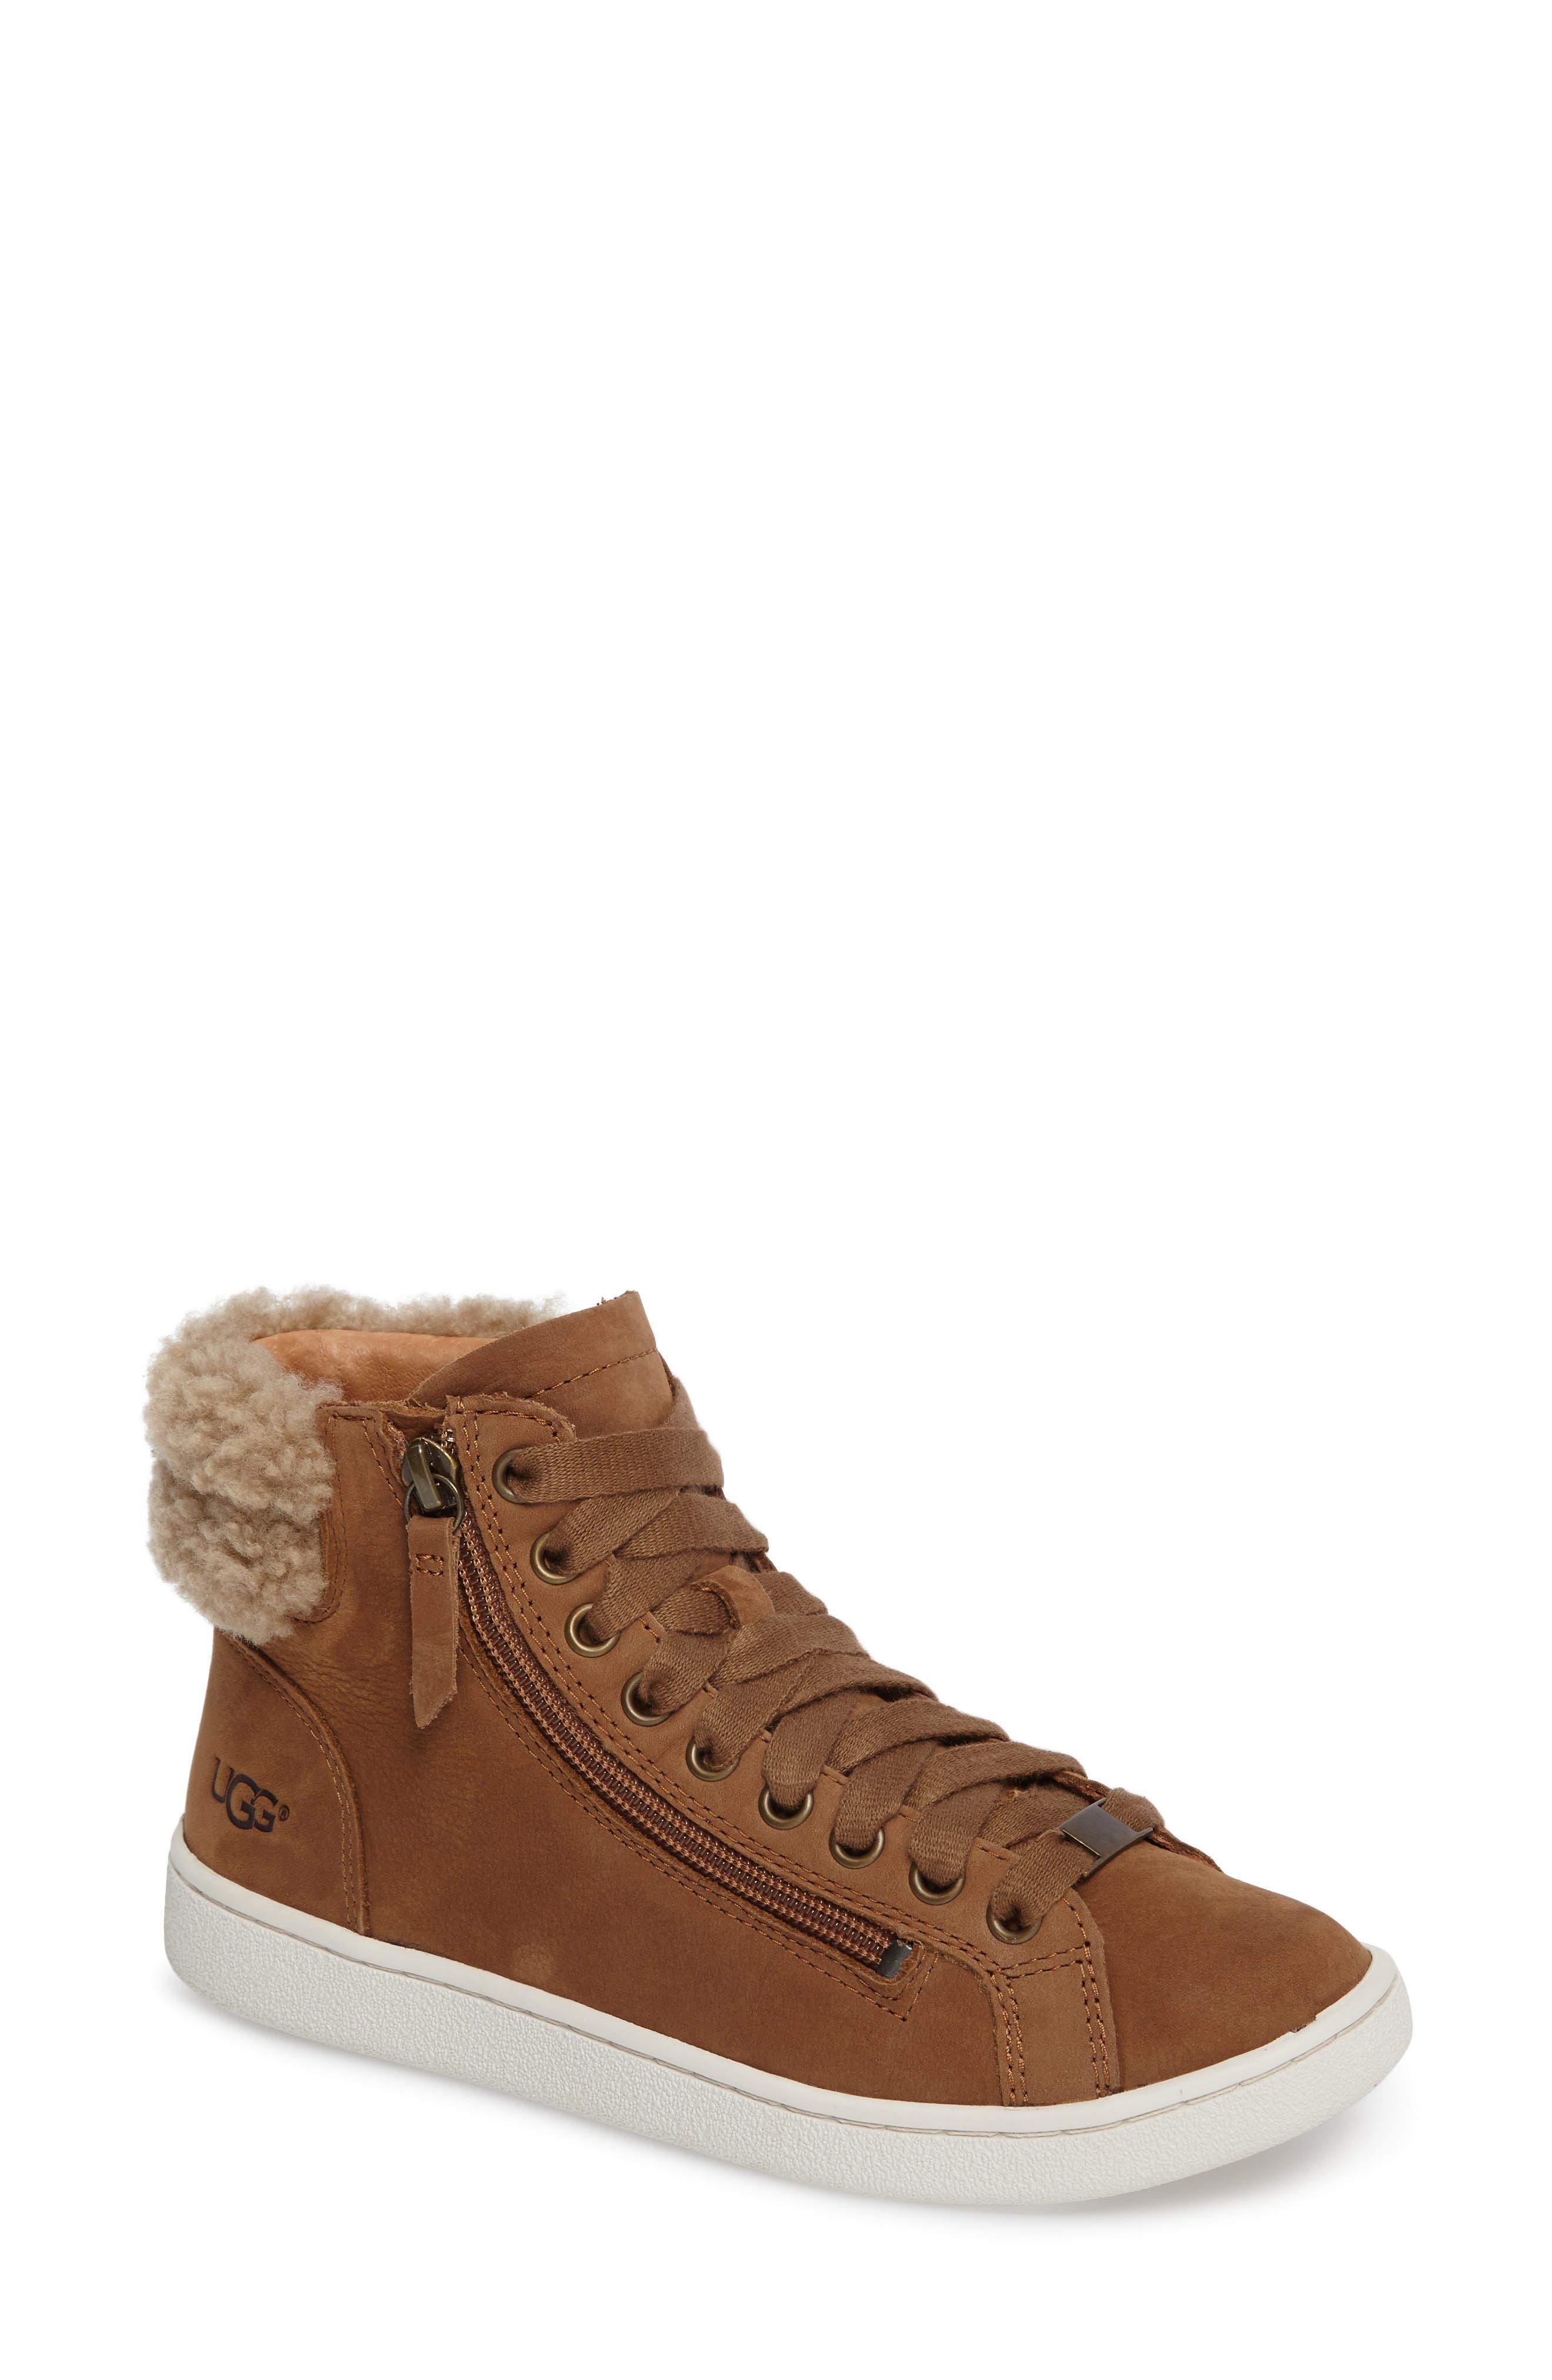 Alternate Image 1 Selected - UGG® Olive Genuine Shearling Cuff Sneaker (Women)